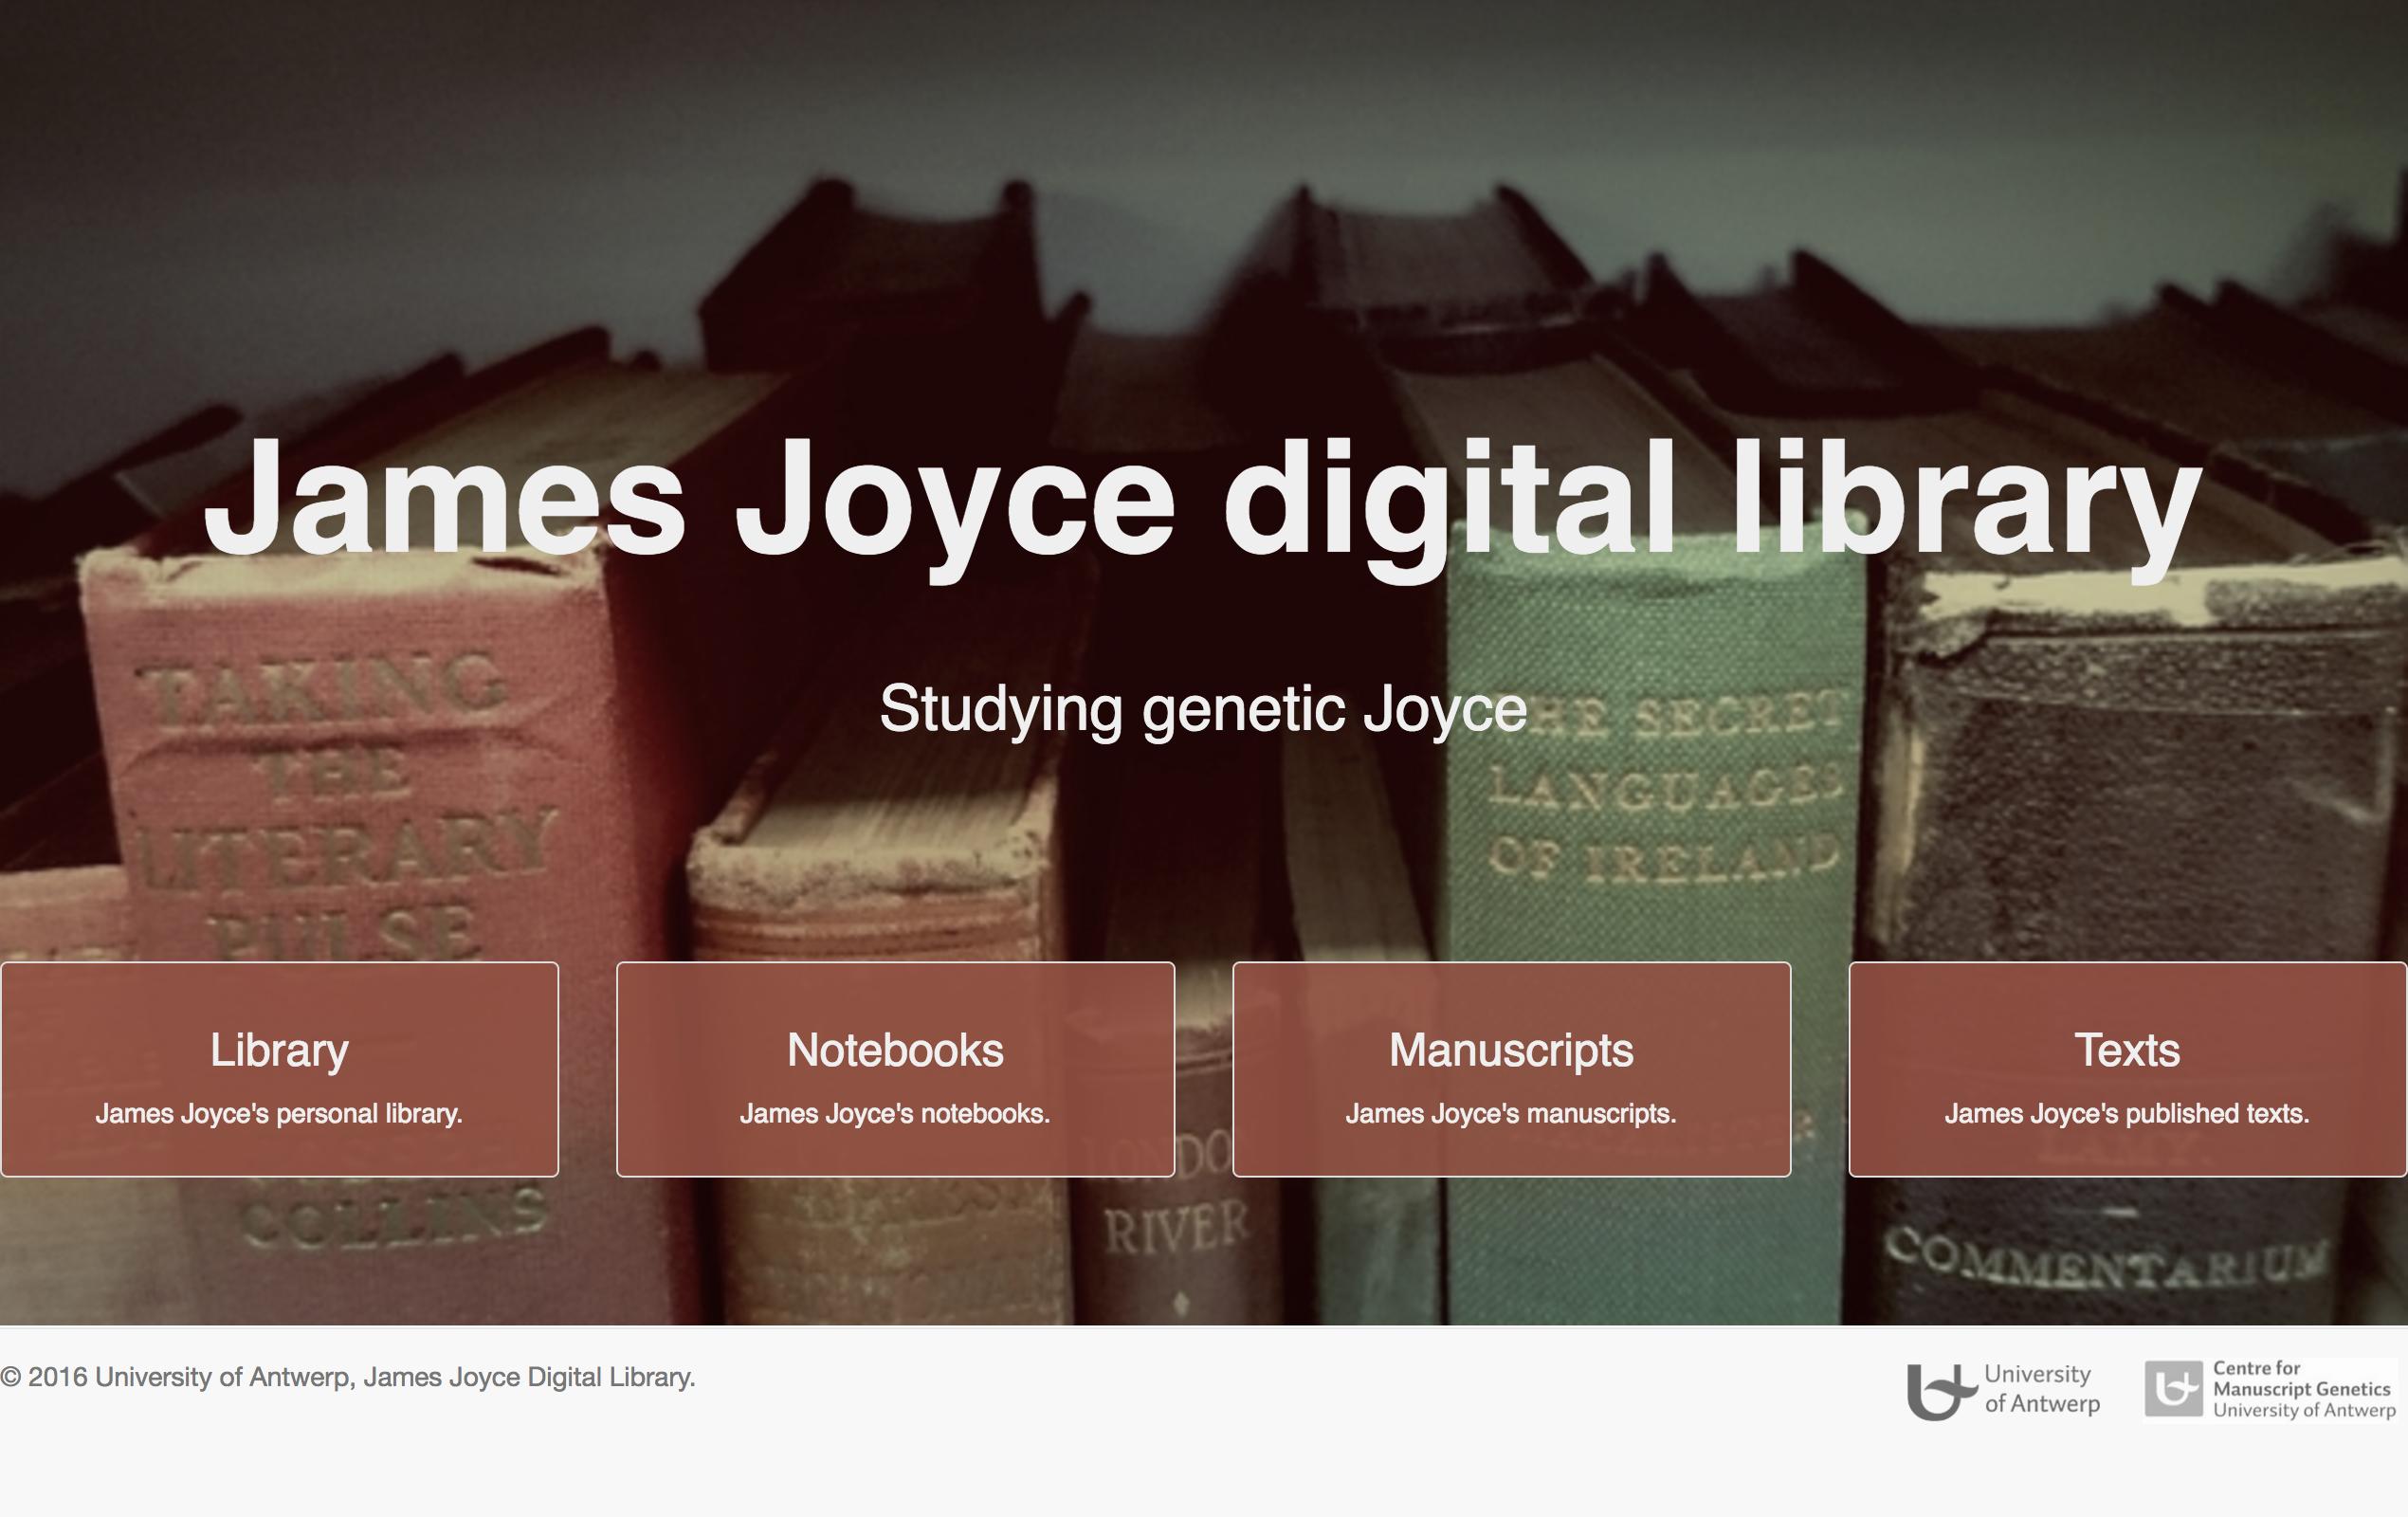 James Joyce Digital Library